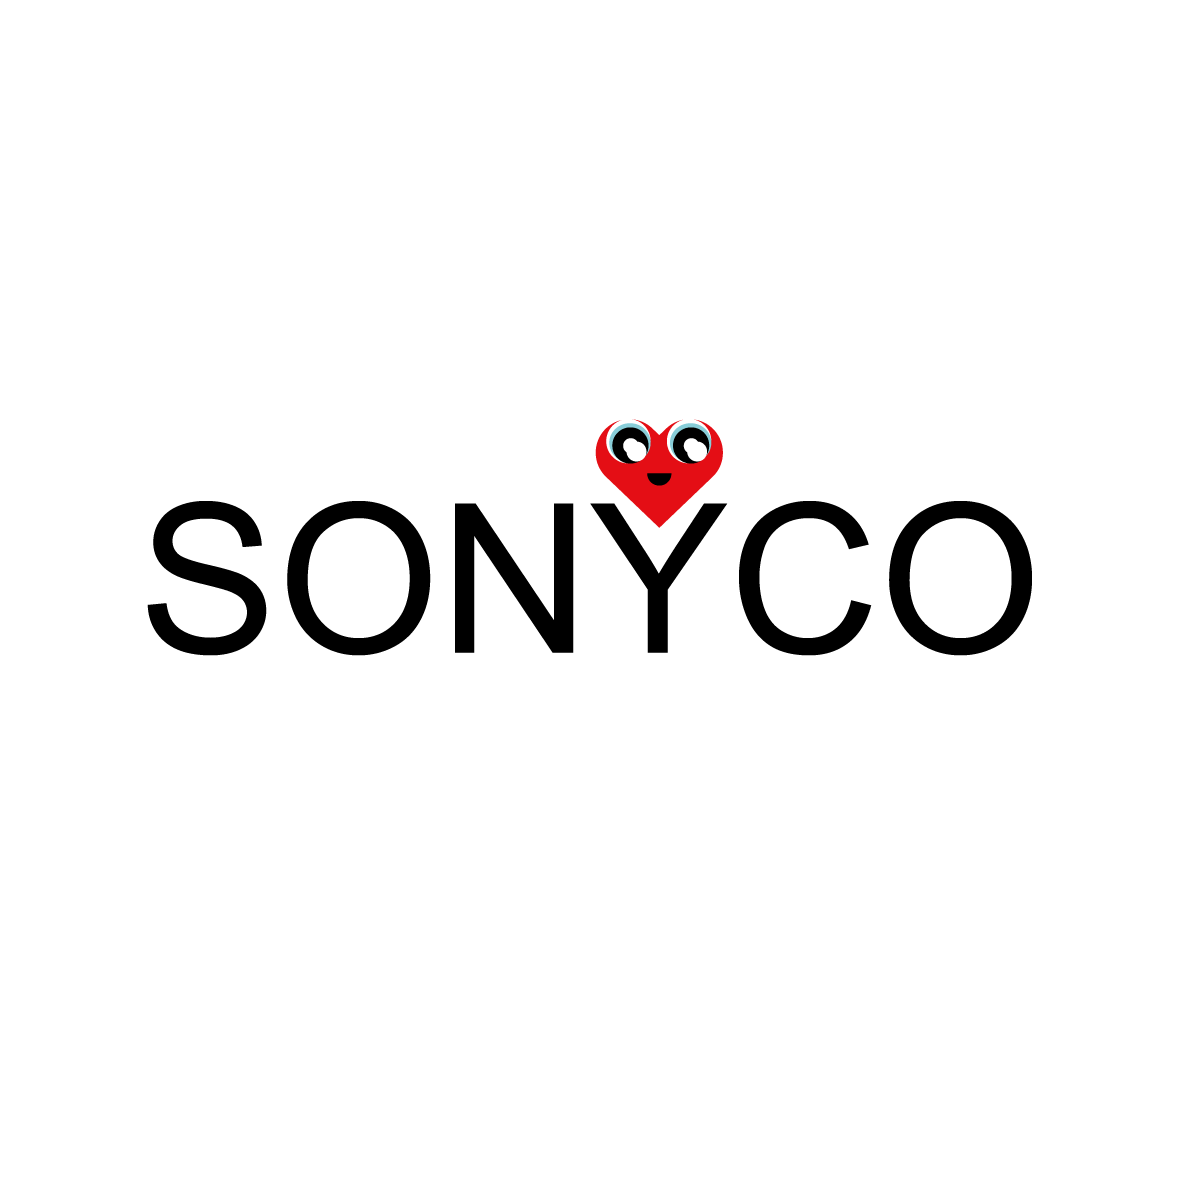 Logotipo Sony Nerea Orgambides